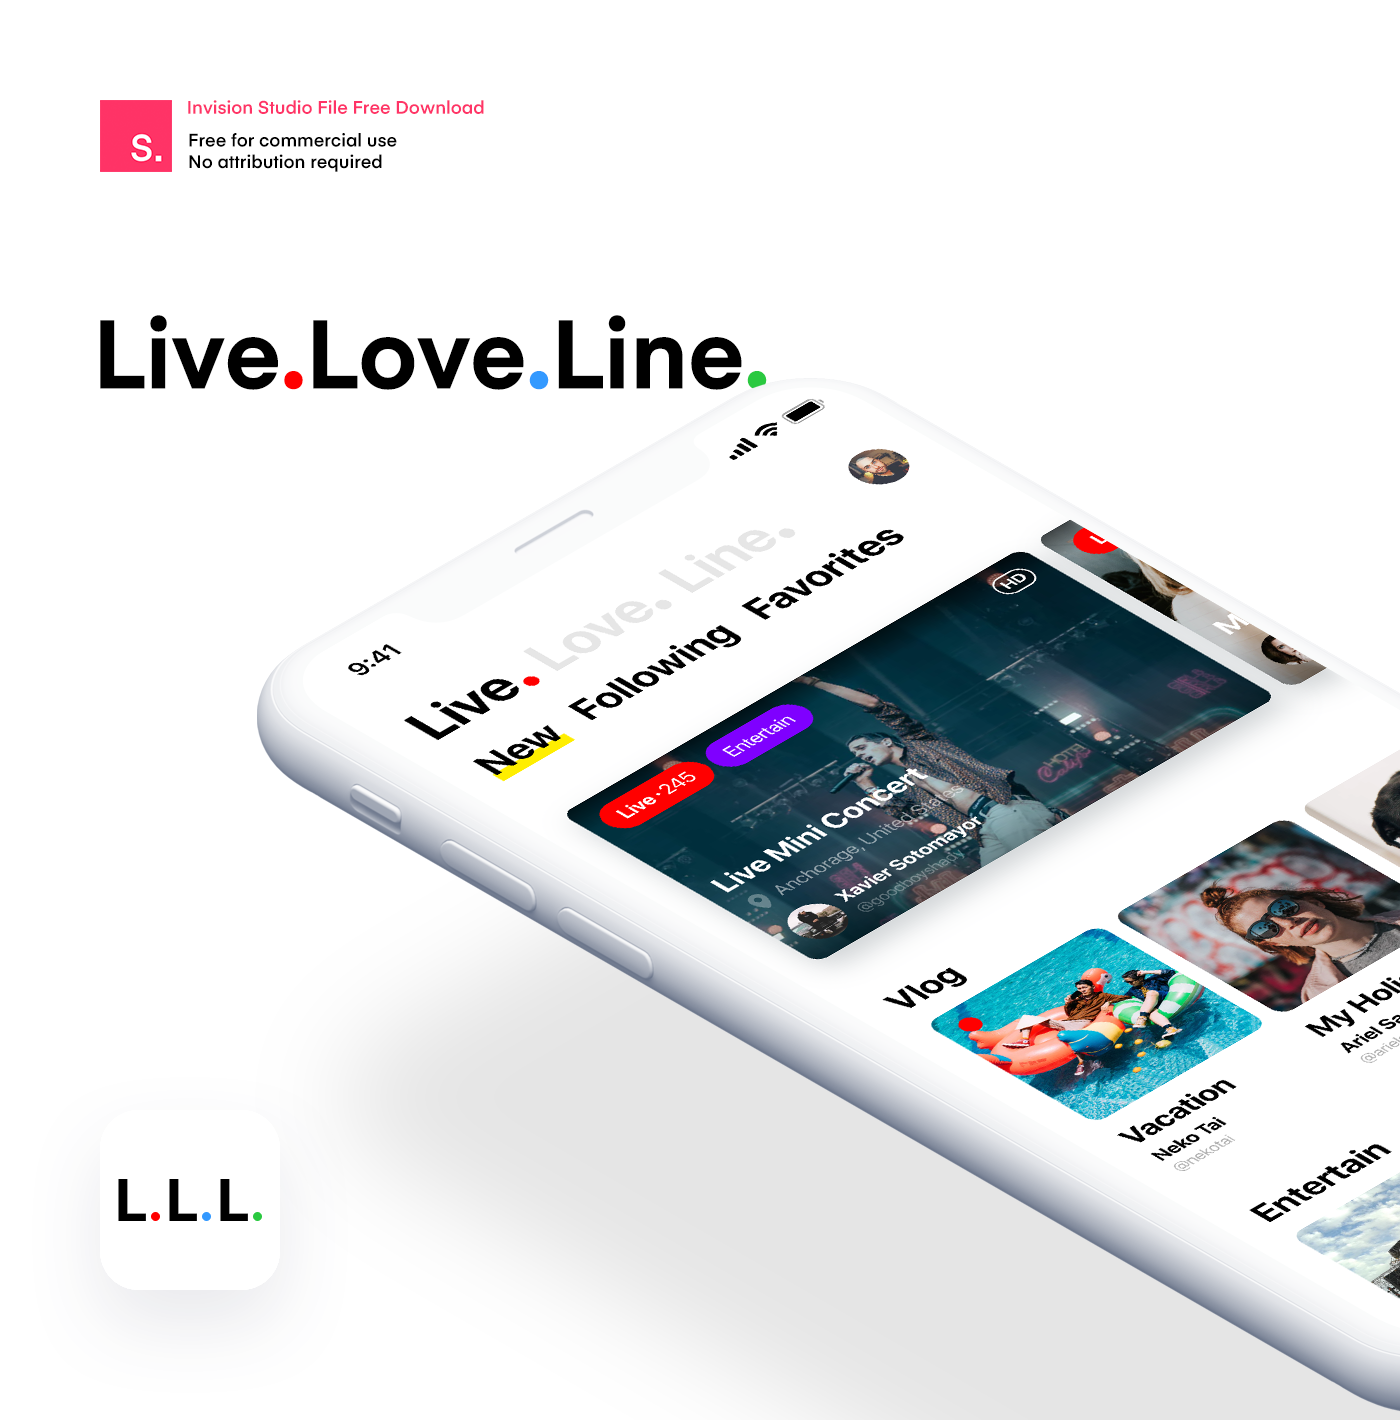 Live Love Line - Invision Studio File Free Download on Behance